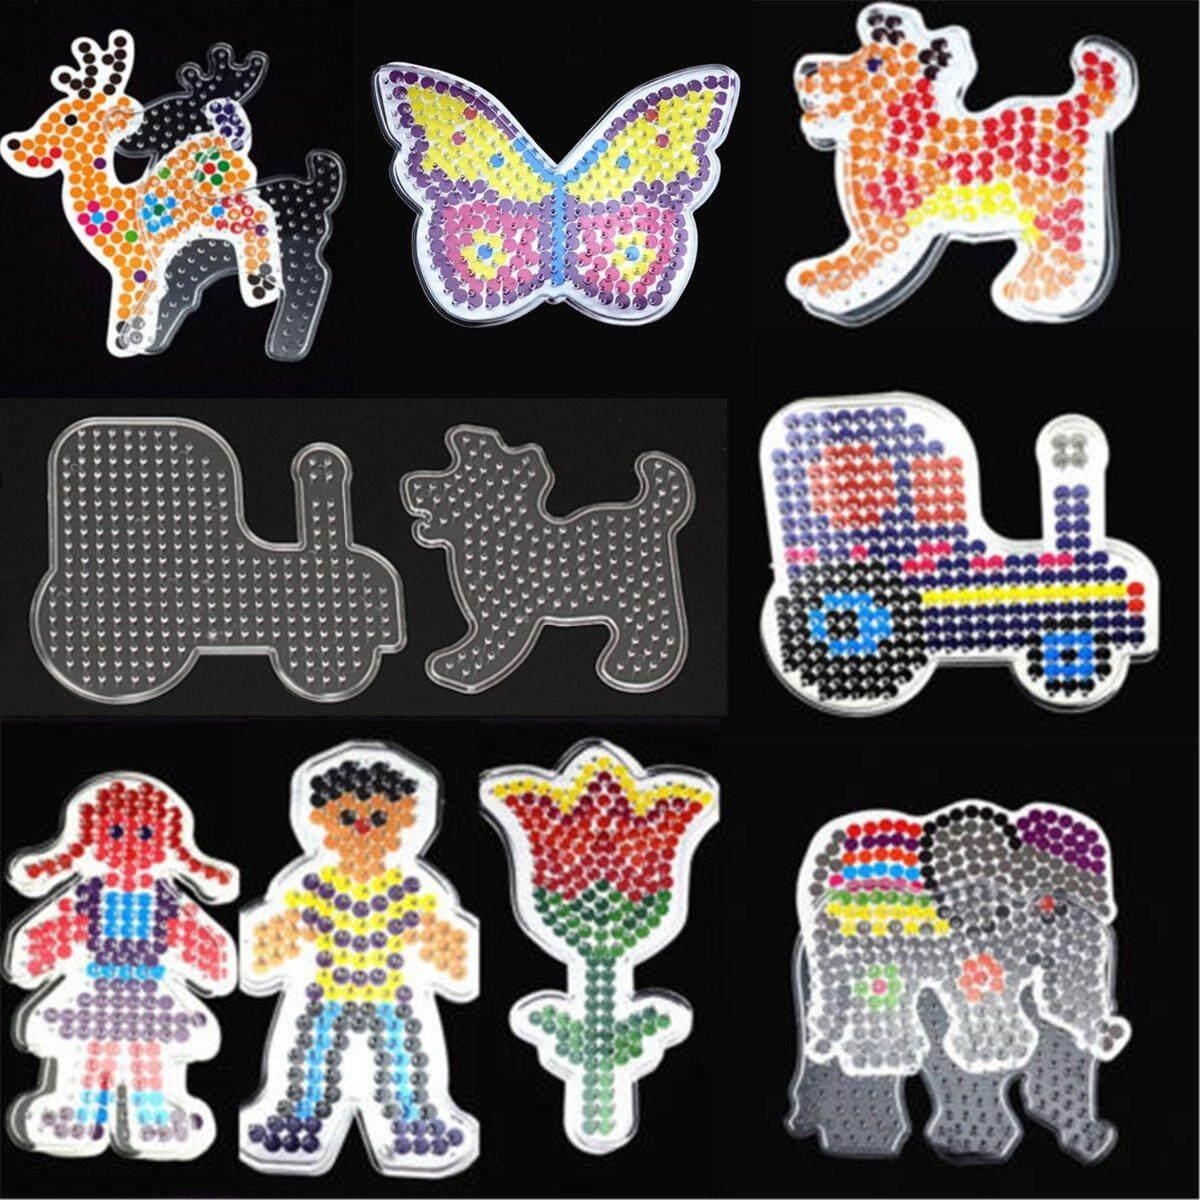 Hình ảnh 9PCS Set Clear Perler Hama Beads Peg Board Pegboard Template Funny DIY Toy Craft - intl